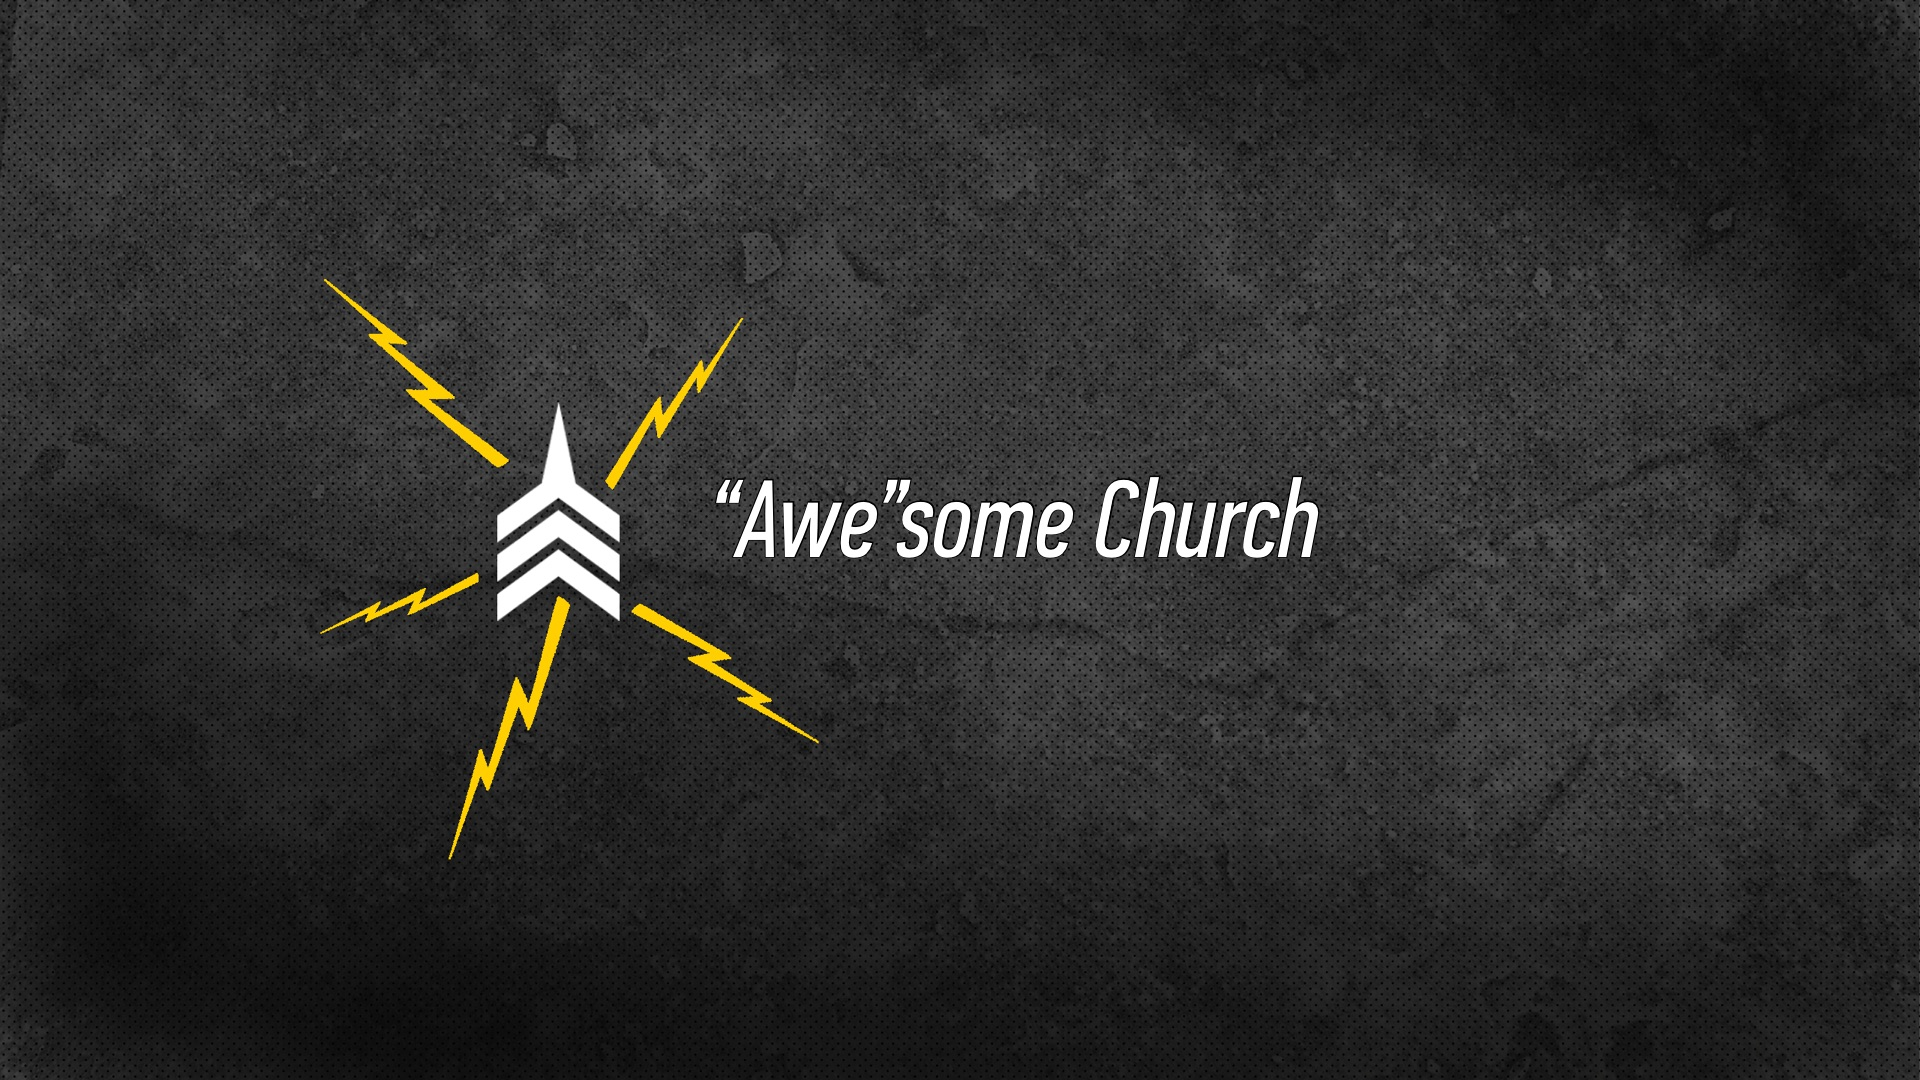 20160626 -Awe-some Church.jpg